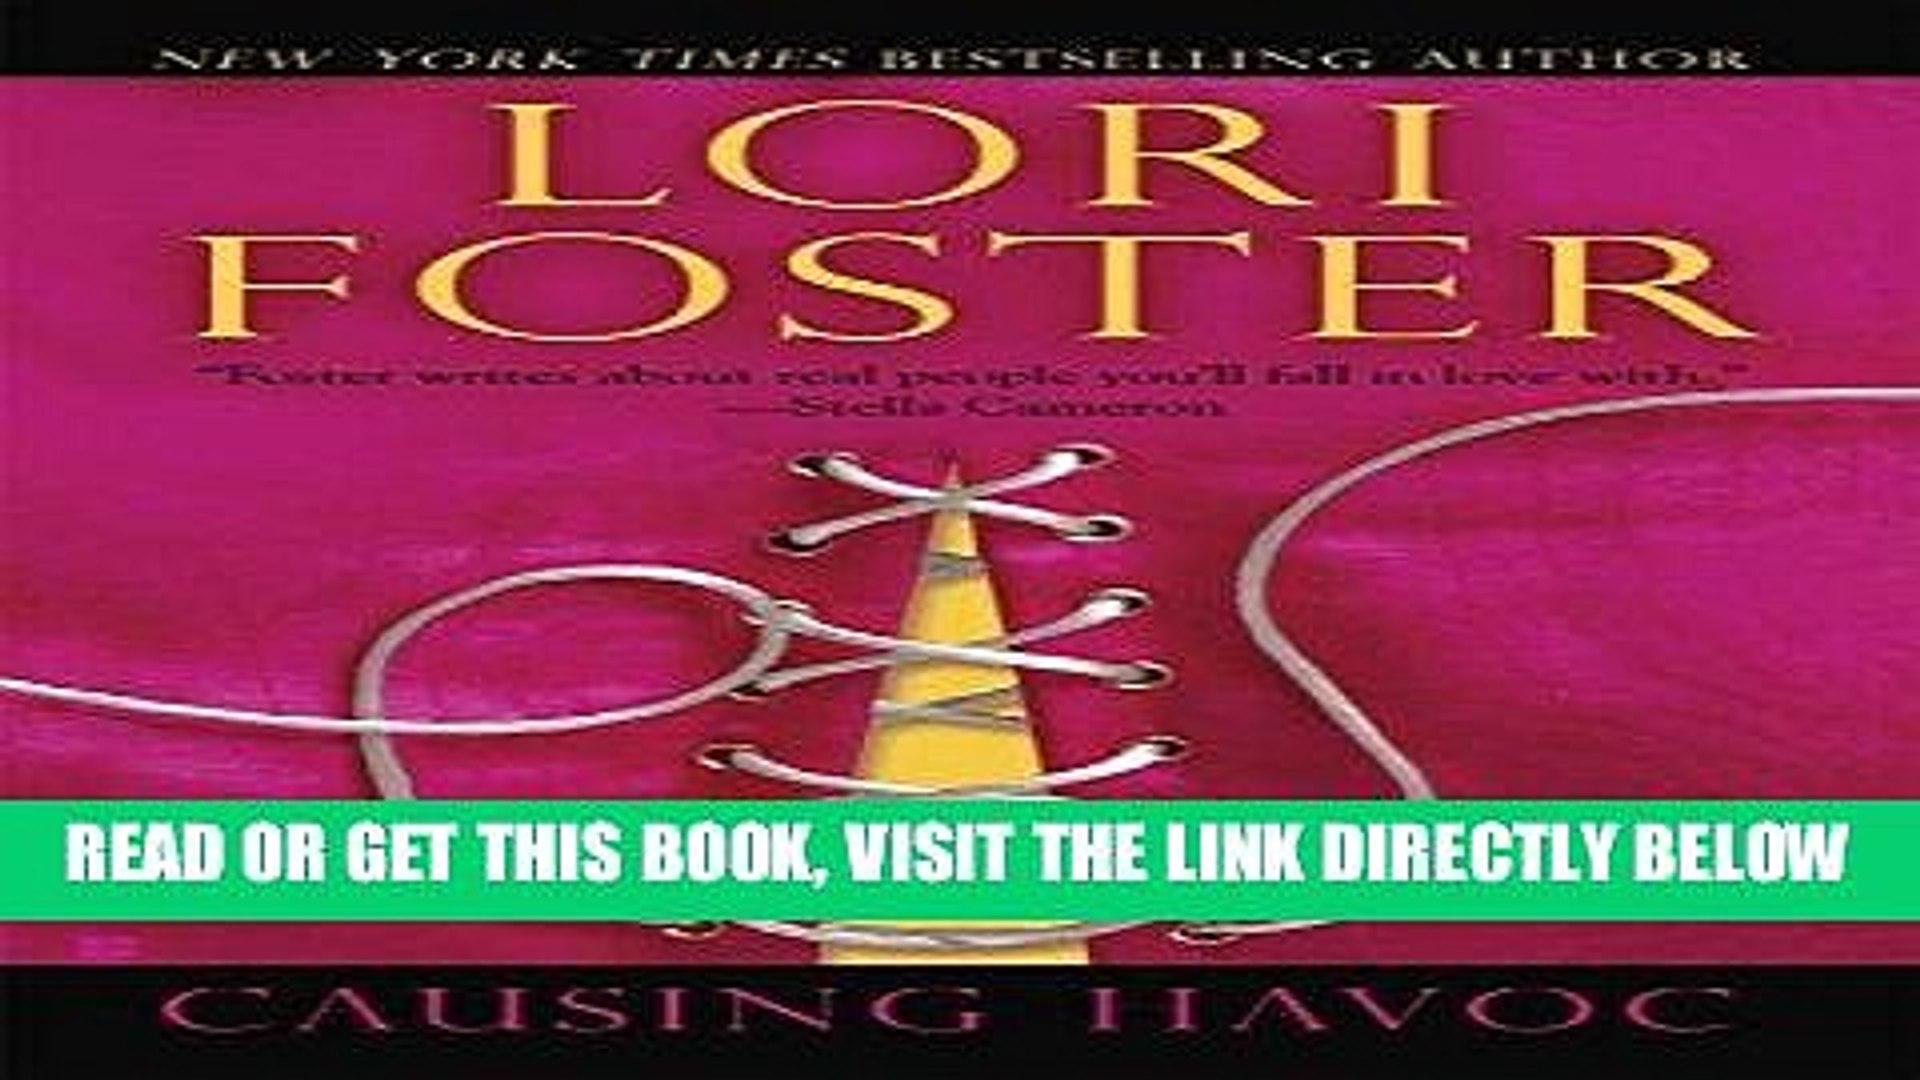 Causing Havoc (SBC Fighters, Book 1)